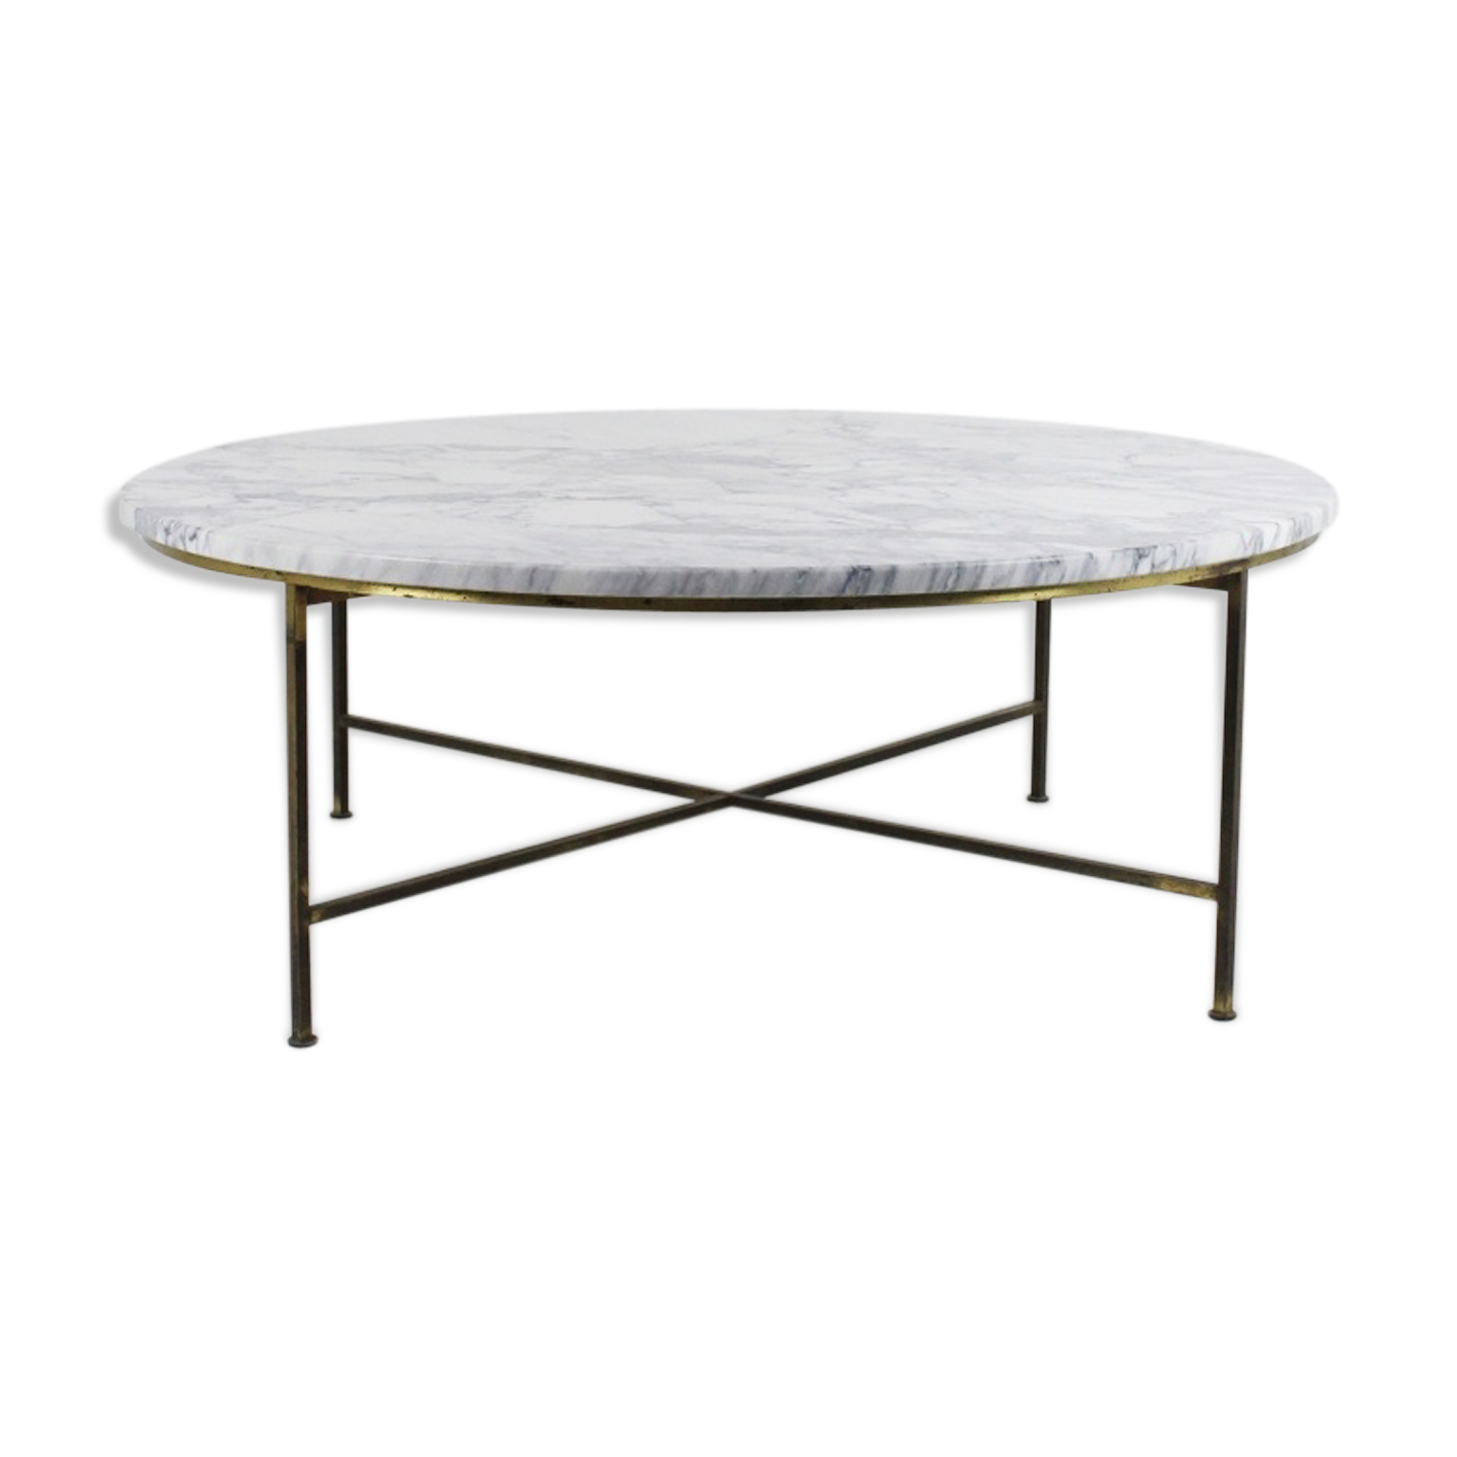 table basse dessus marbre latest table basse plateau marbre new table basse table basse design. Black Bedroom Furniture Sets. Home Design Ideas